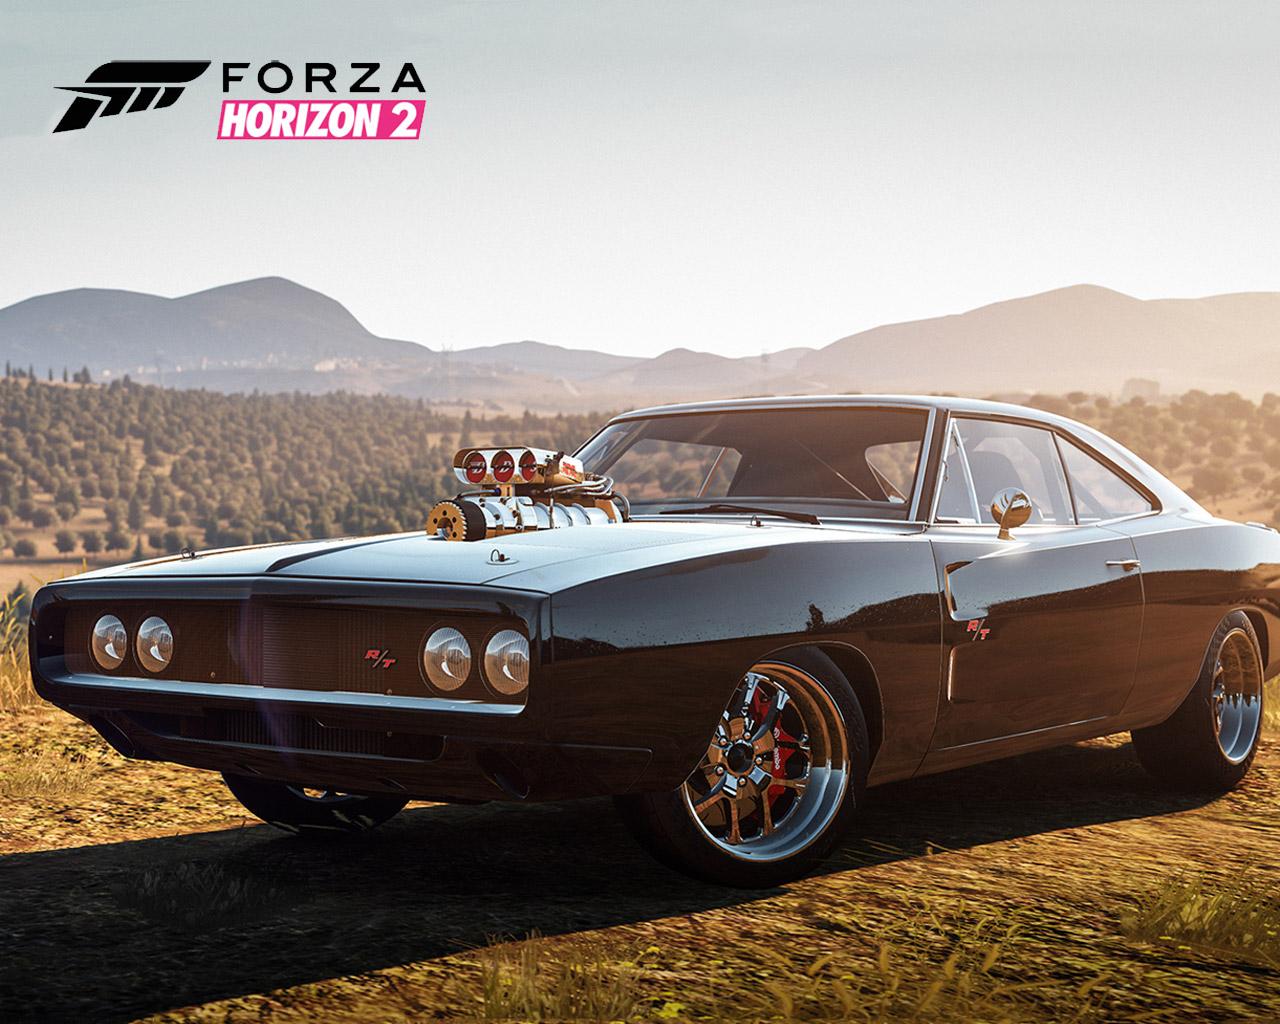 Forza Horizon 2 Wallpaper in 1280x1024